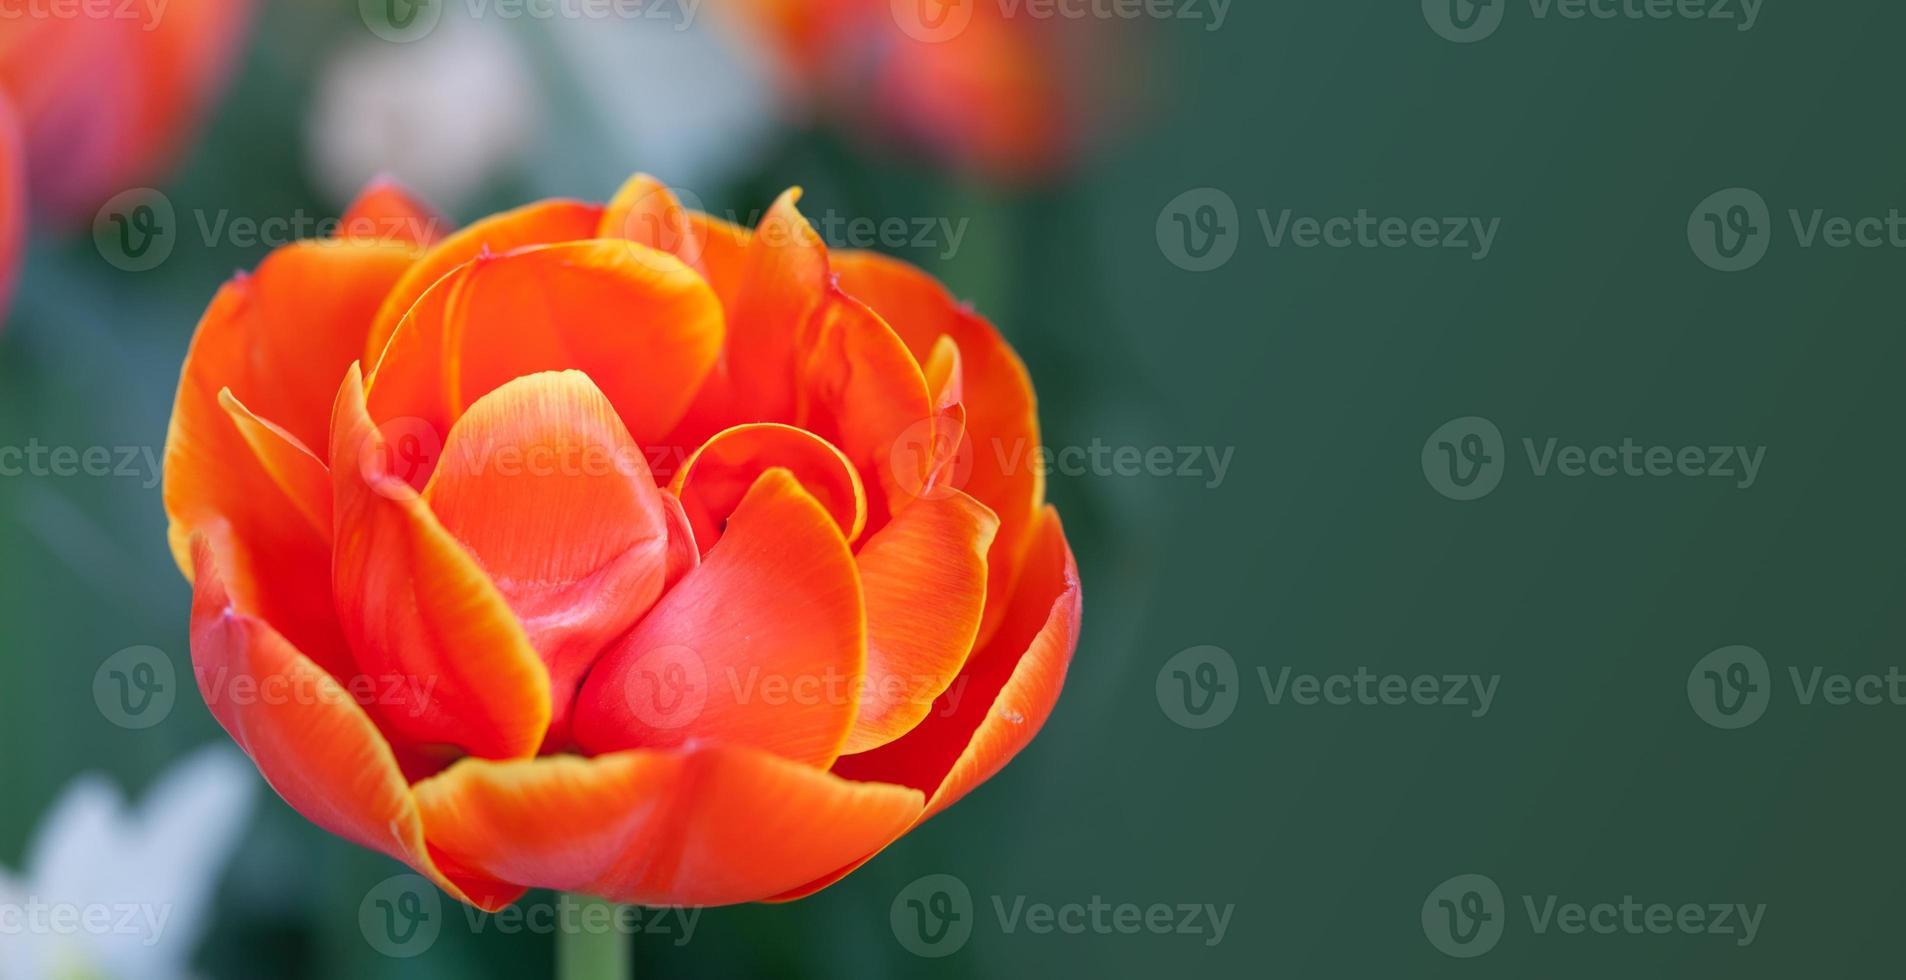 röd blomma tulpan. kopiera utrymme foto